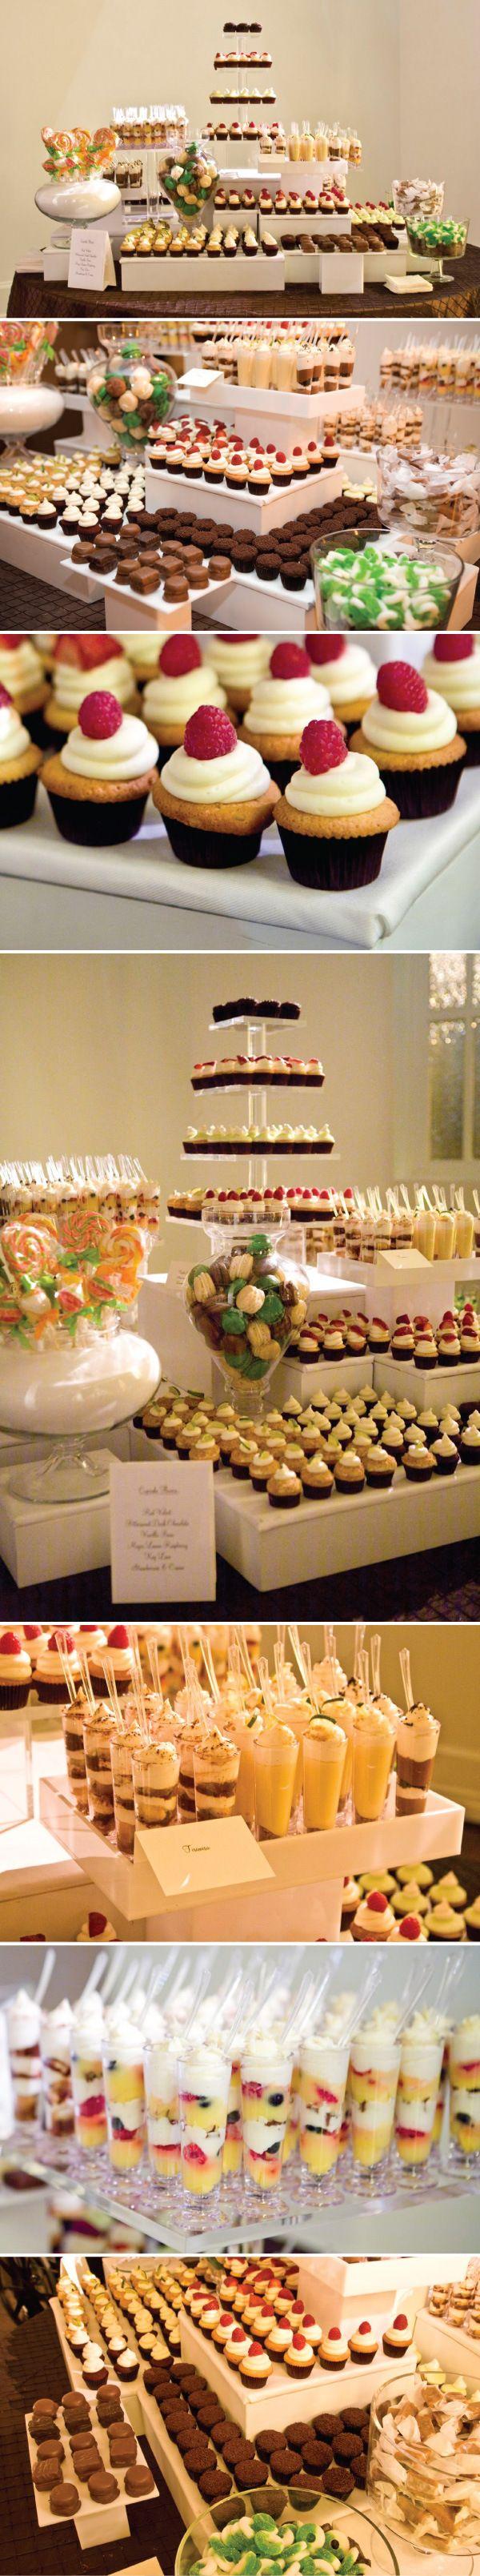 New Wedding Candy Buffet Photos! | ♥ Seven Weddings ♥